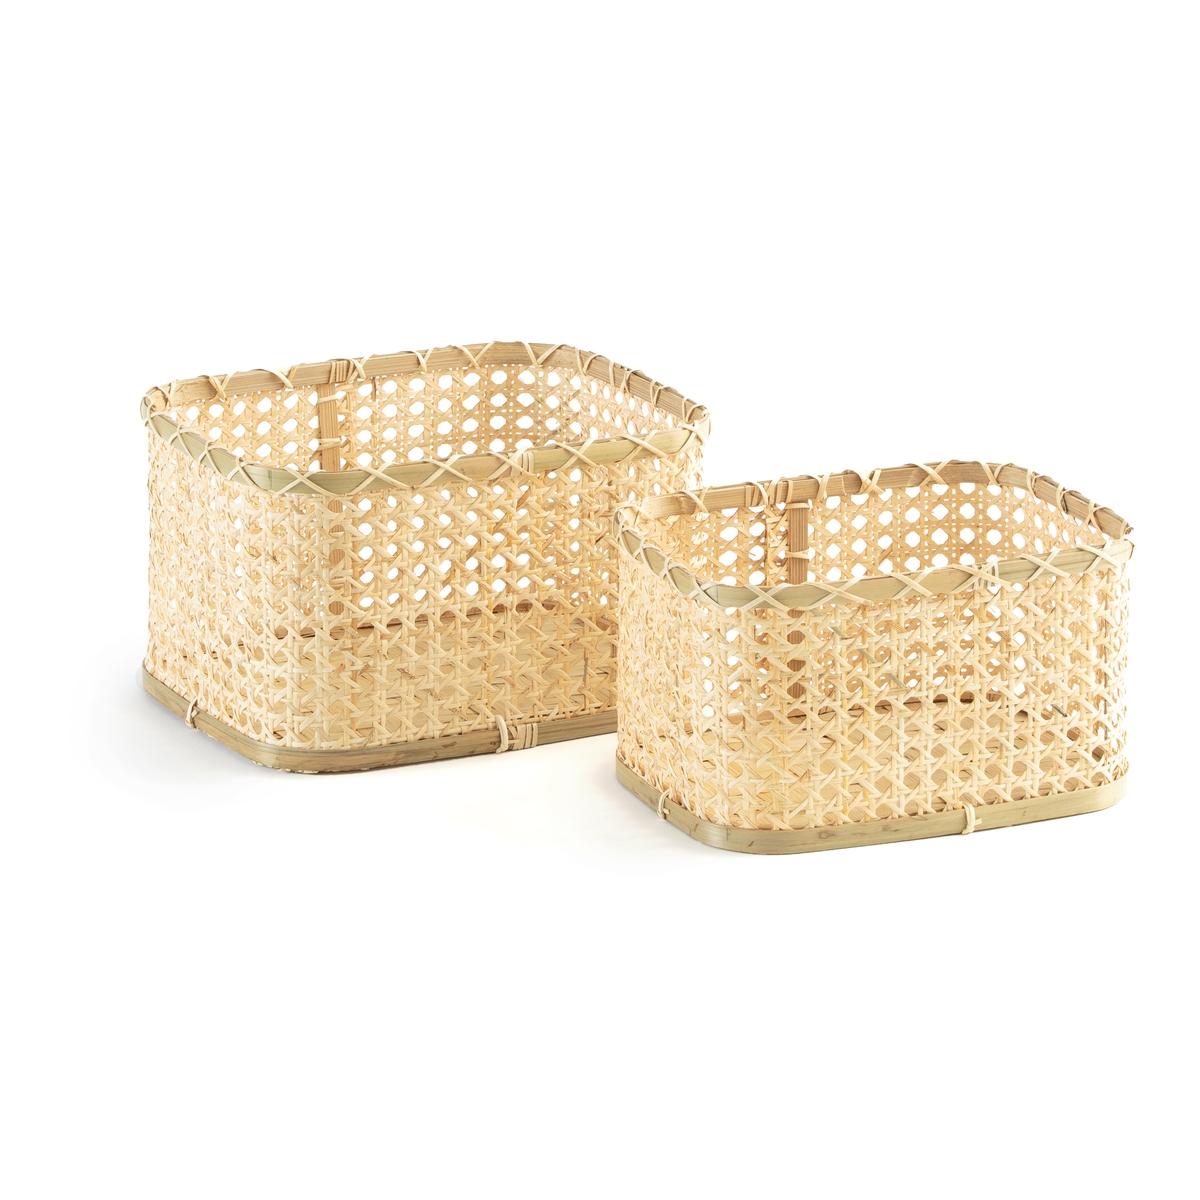 Комплект из низких корзин La Redoute Tobi единый размер бежевый поднос la redoute из ротанга vesprie единый размер бежевый